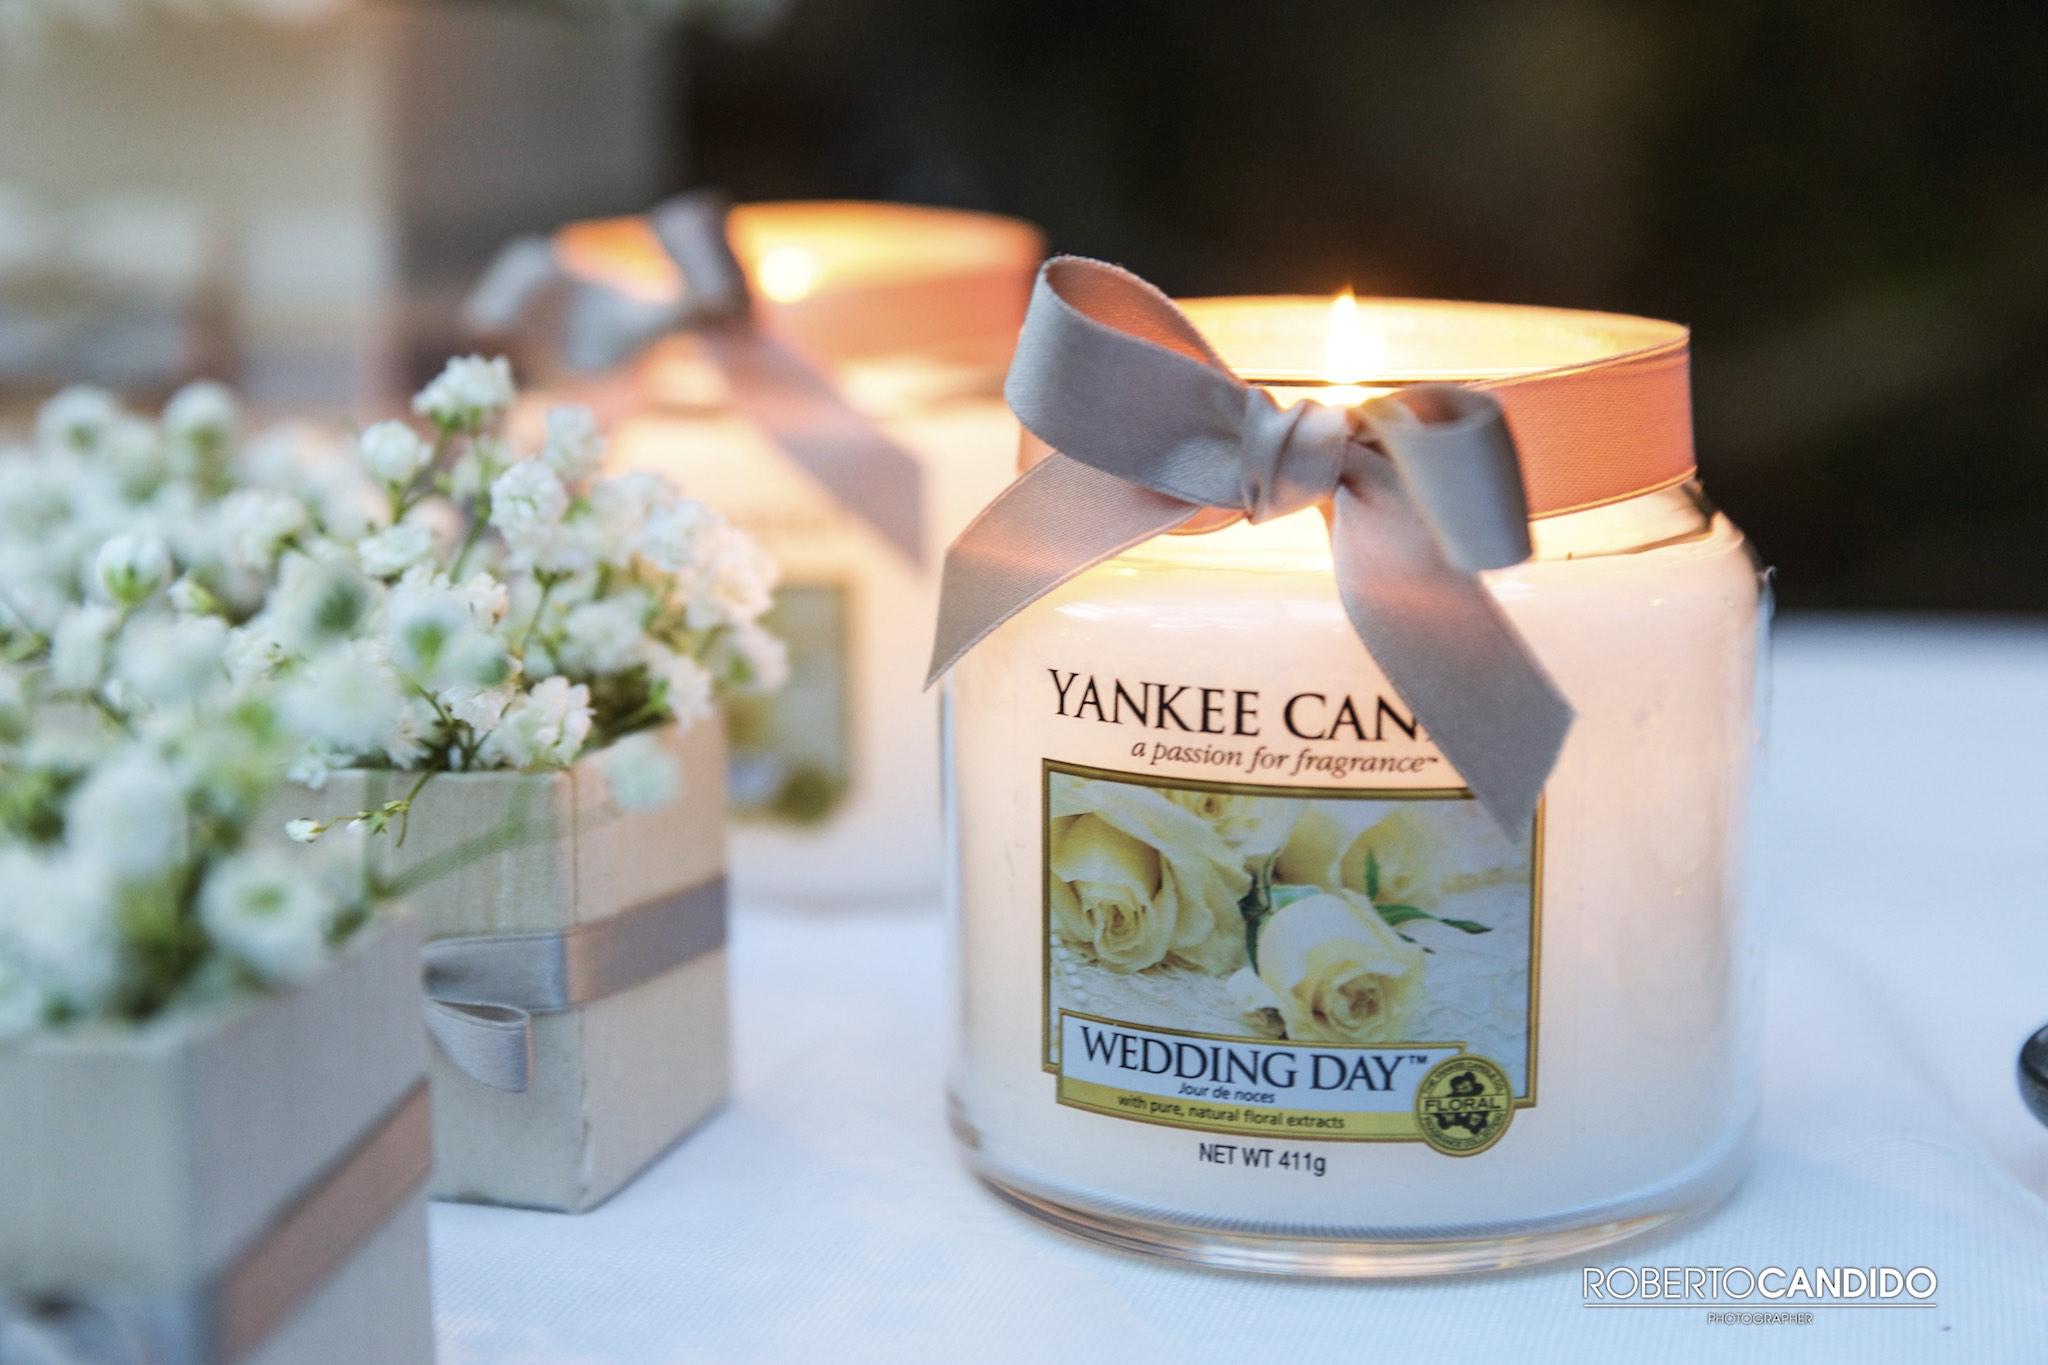 Matrimonio Tema Yankee Candle : Matrimonio castello di torcrescenza cerrone nozze per